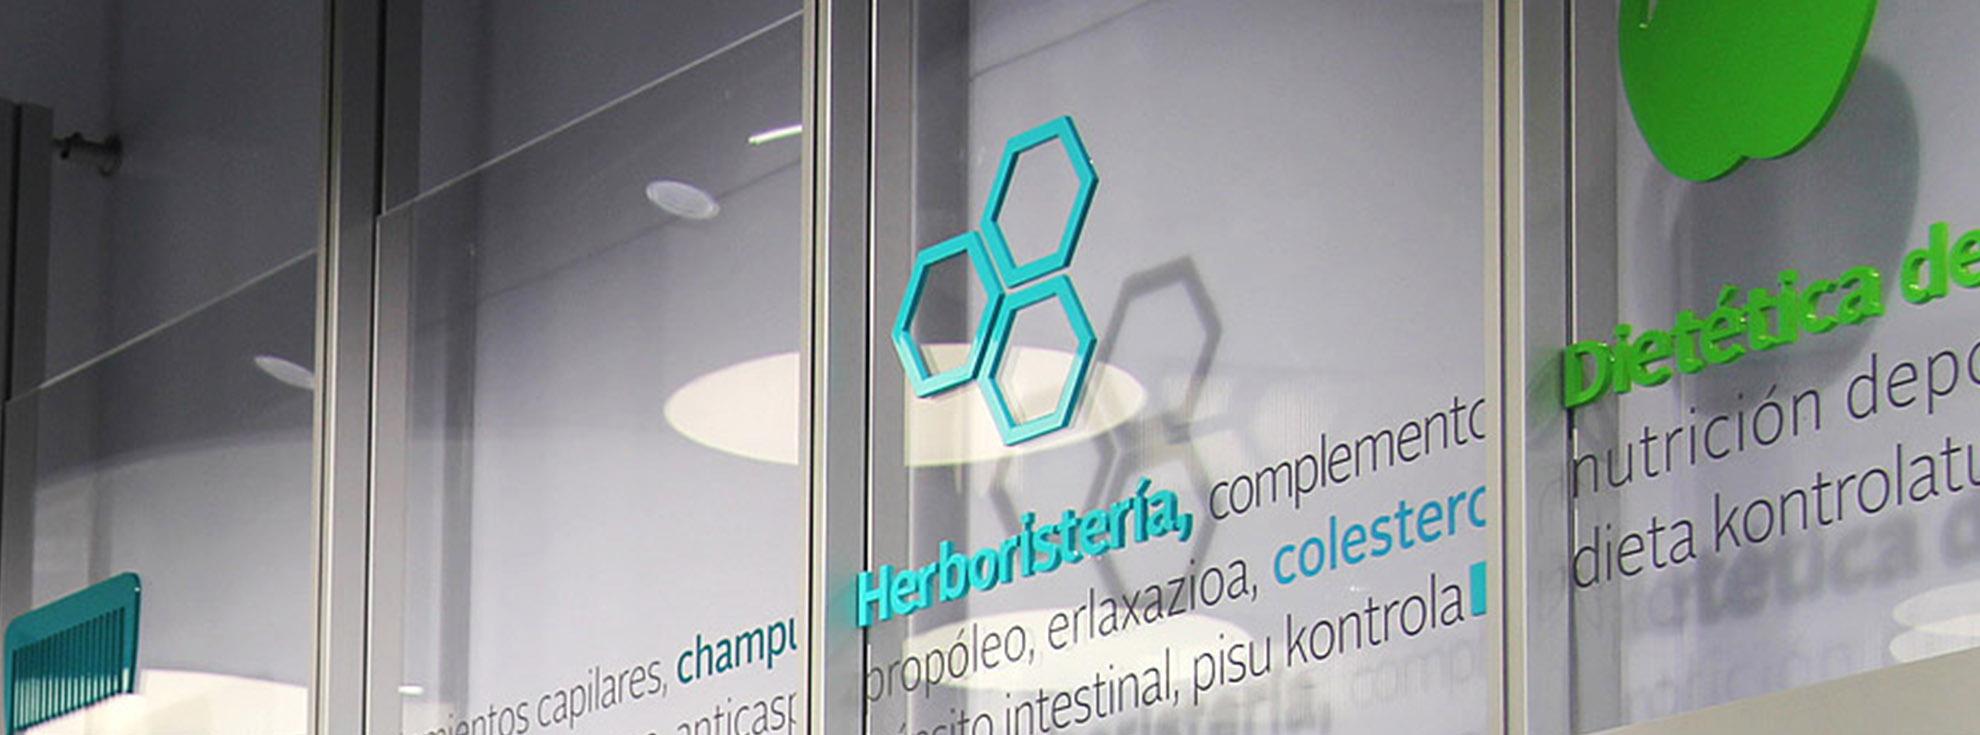 Sirope Proyecto: Farmacia Ruiz Golvano